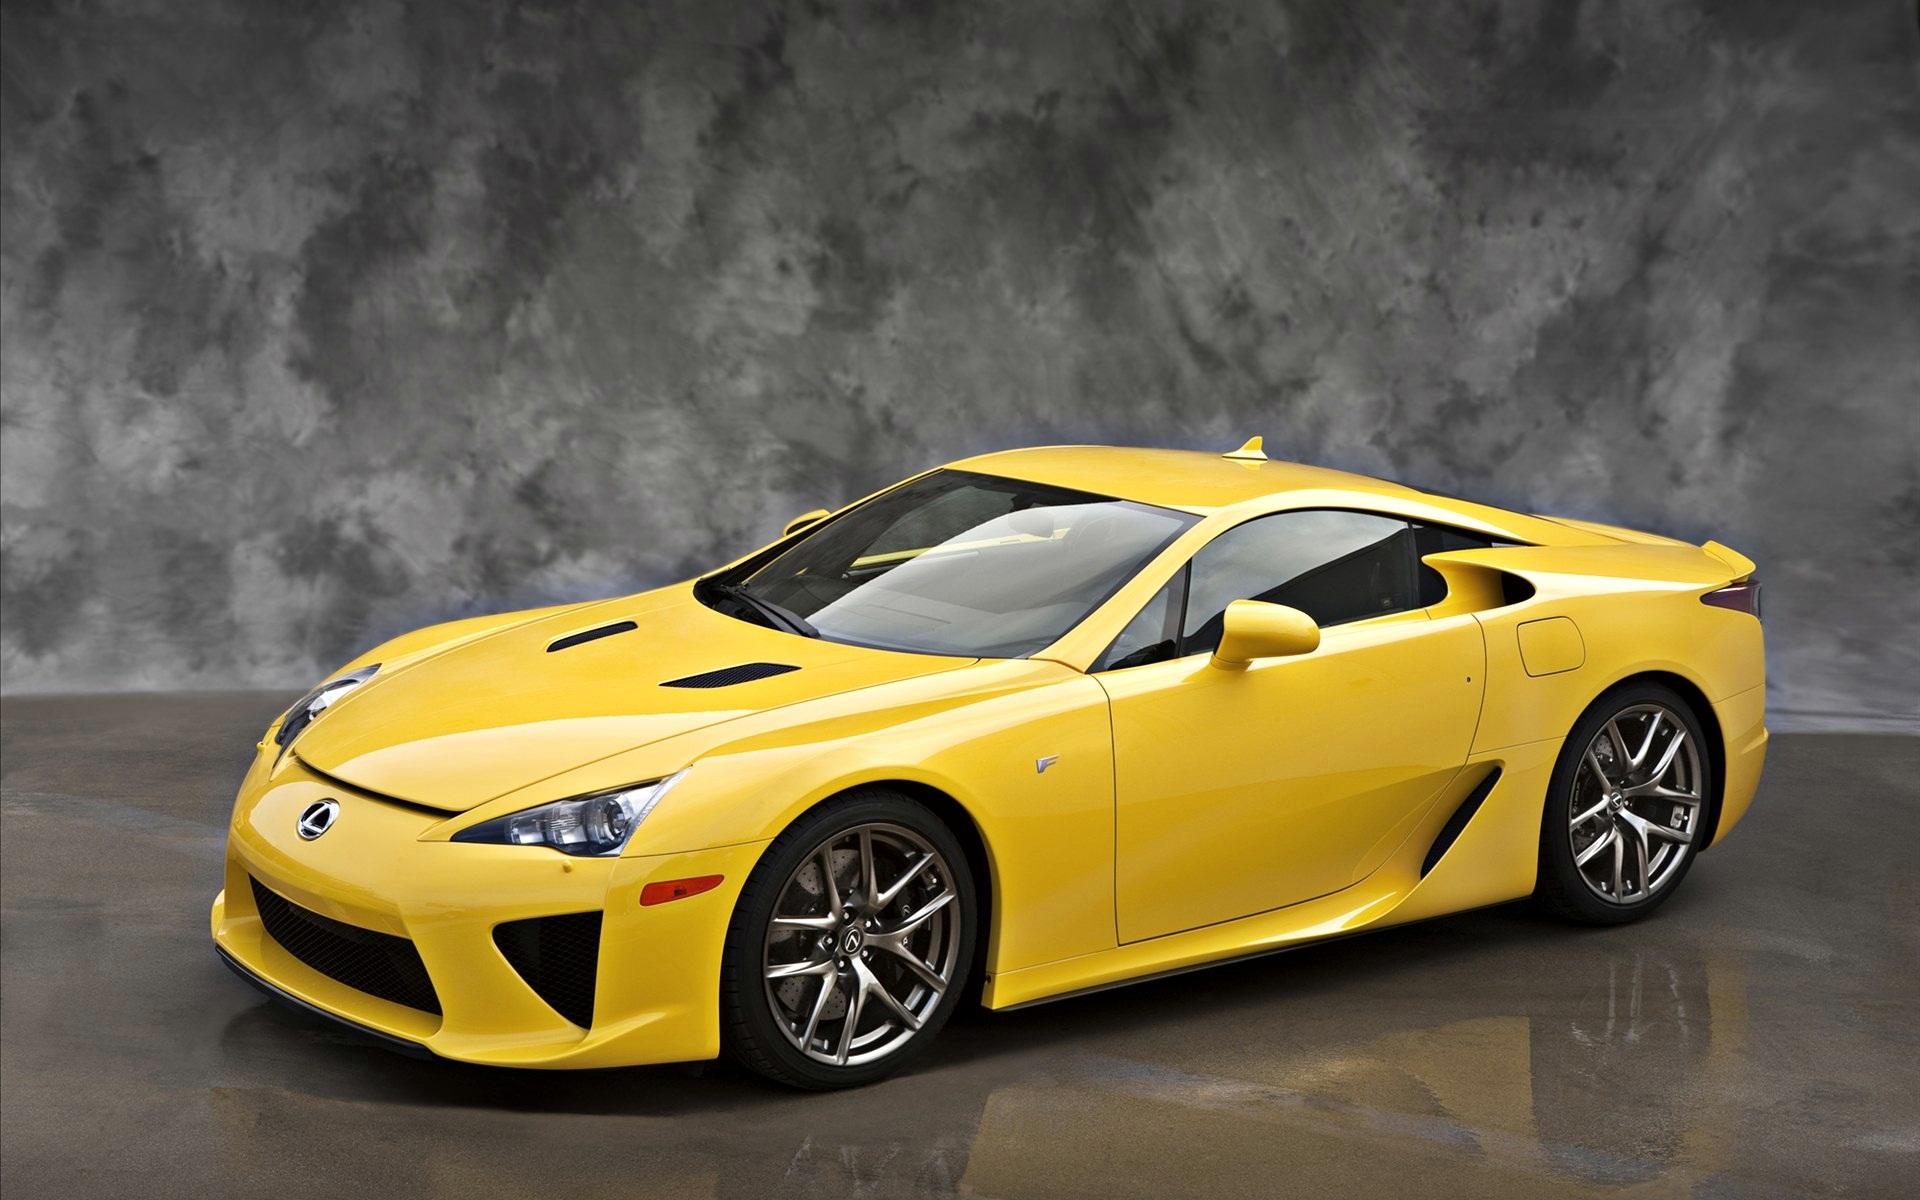 lexus_lfa_2012_car-wide.0.jpg